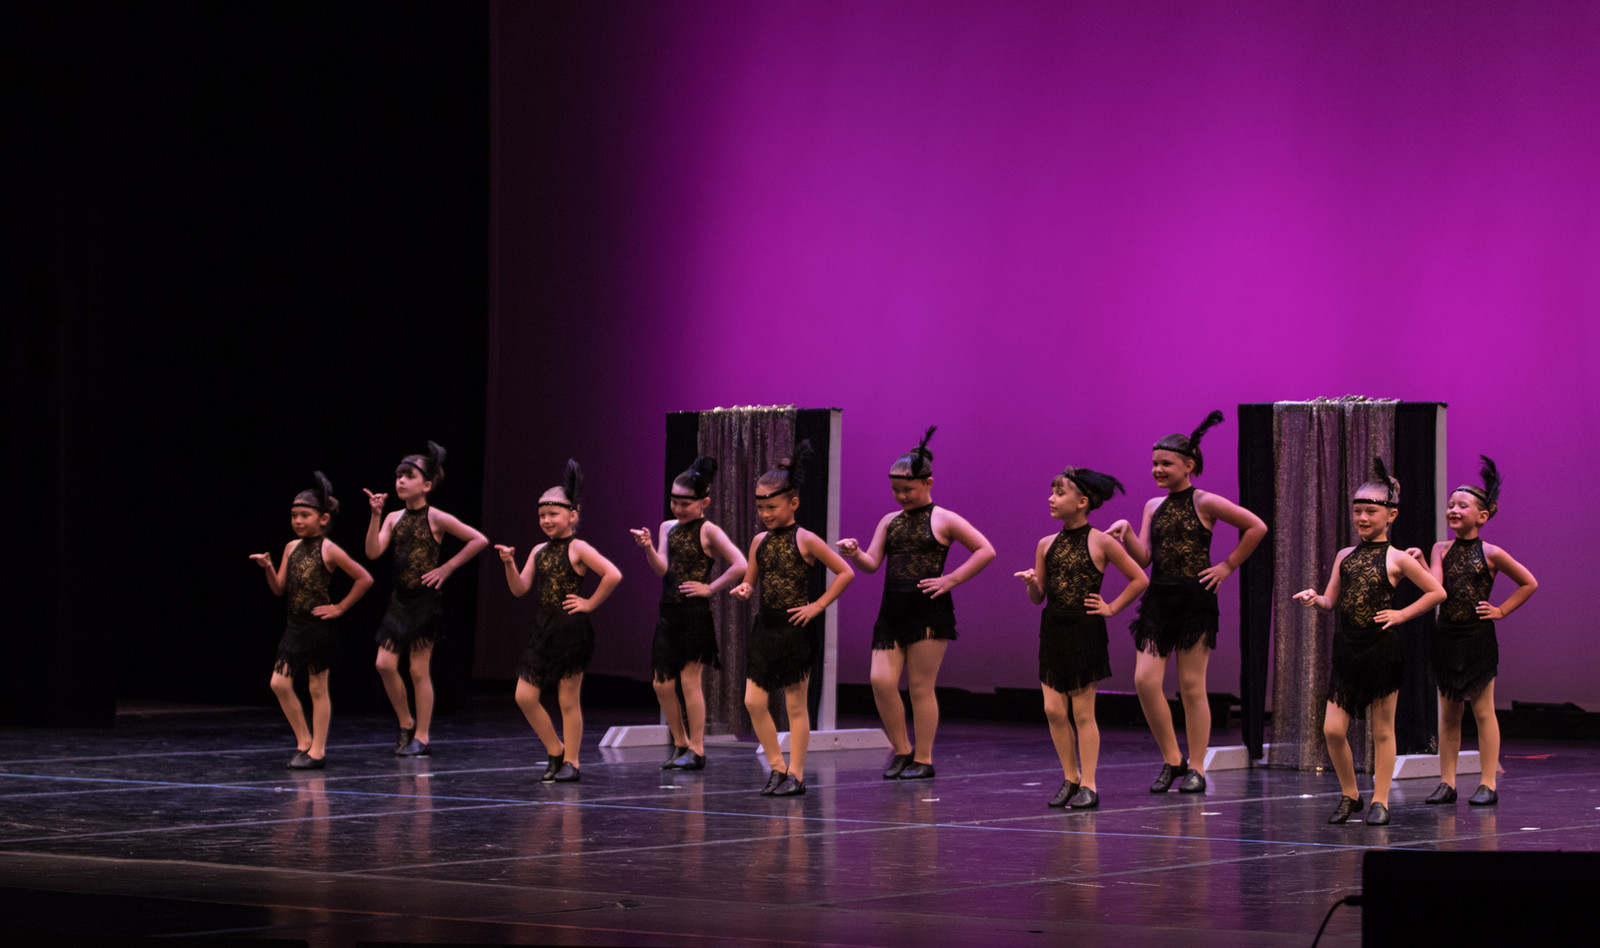 1b4b35b0bfbd Pivotal Academy of Dance in Buda